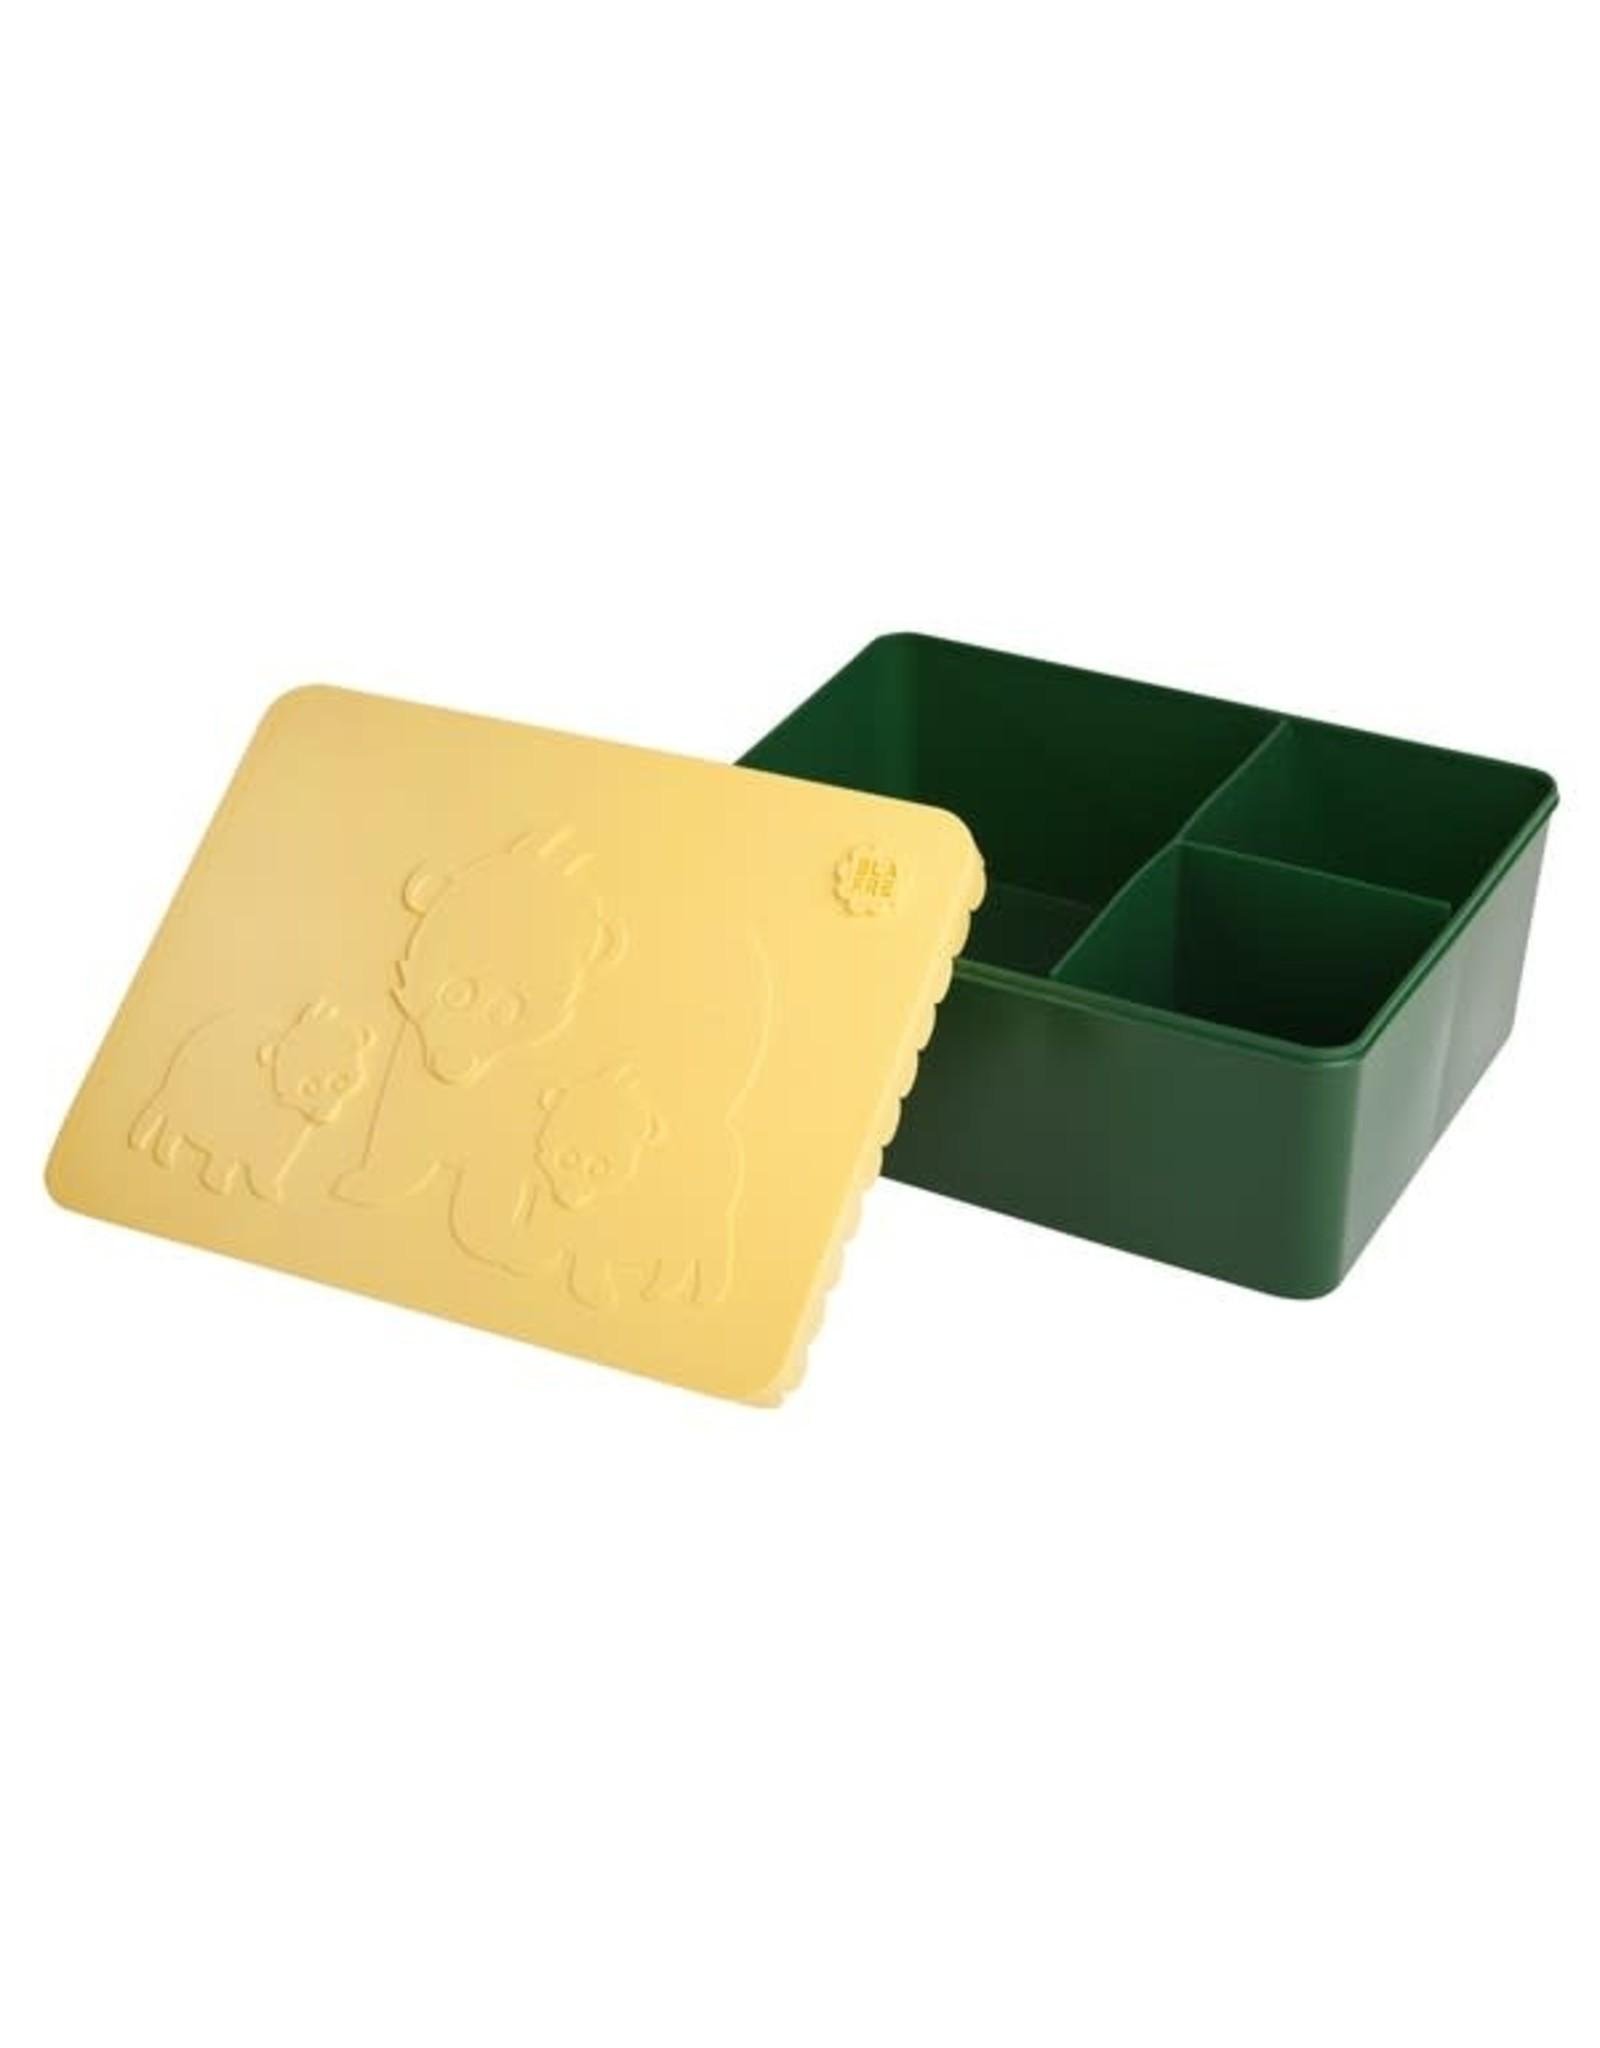 Blafre Blafre Brooddoos Bear Dark Green + Light Yellow